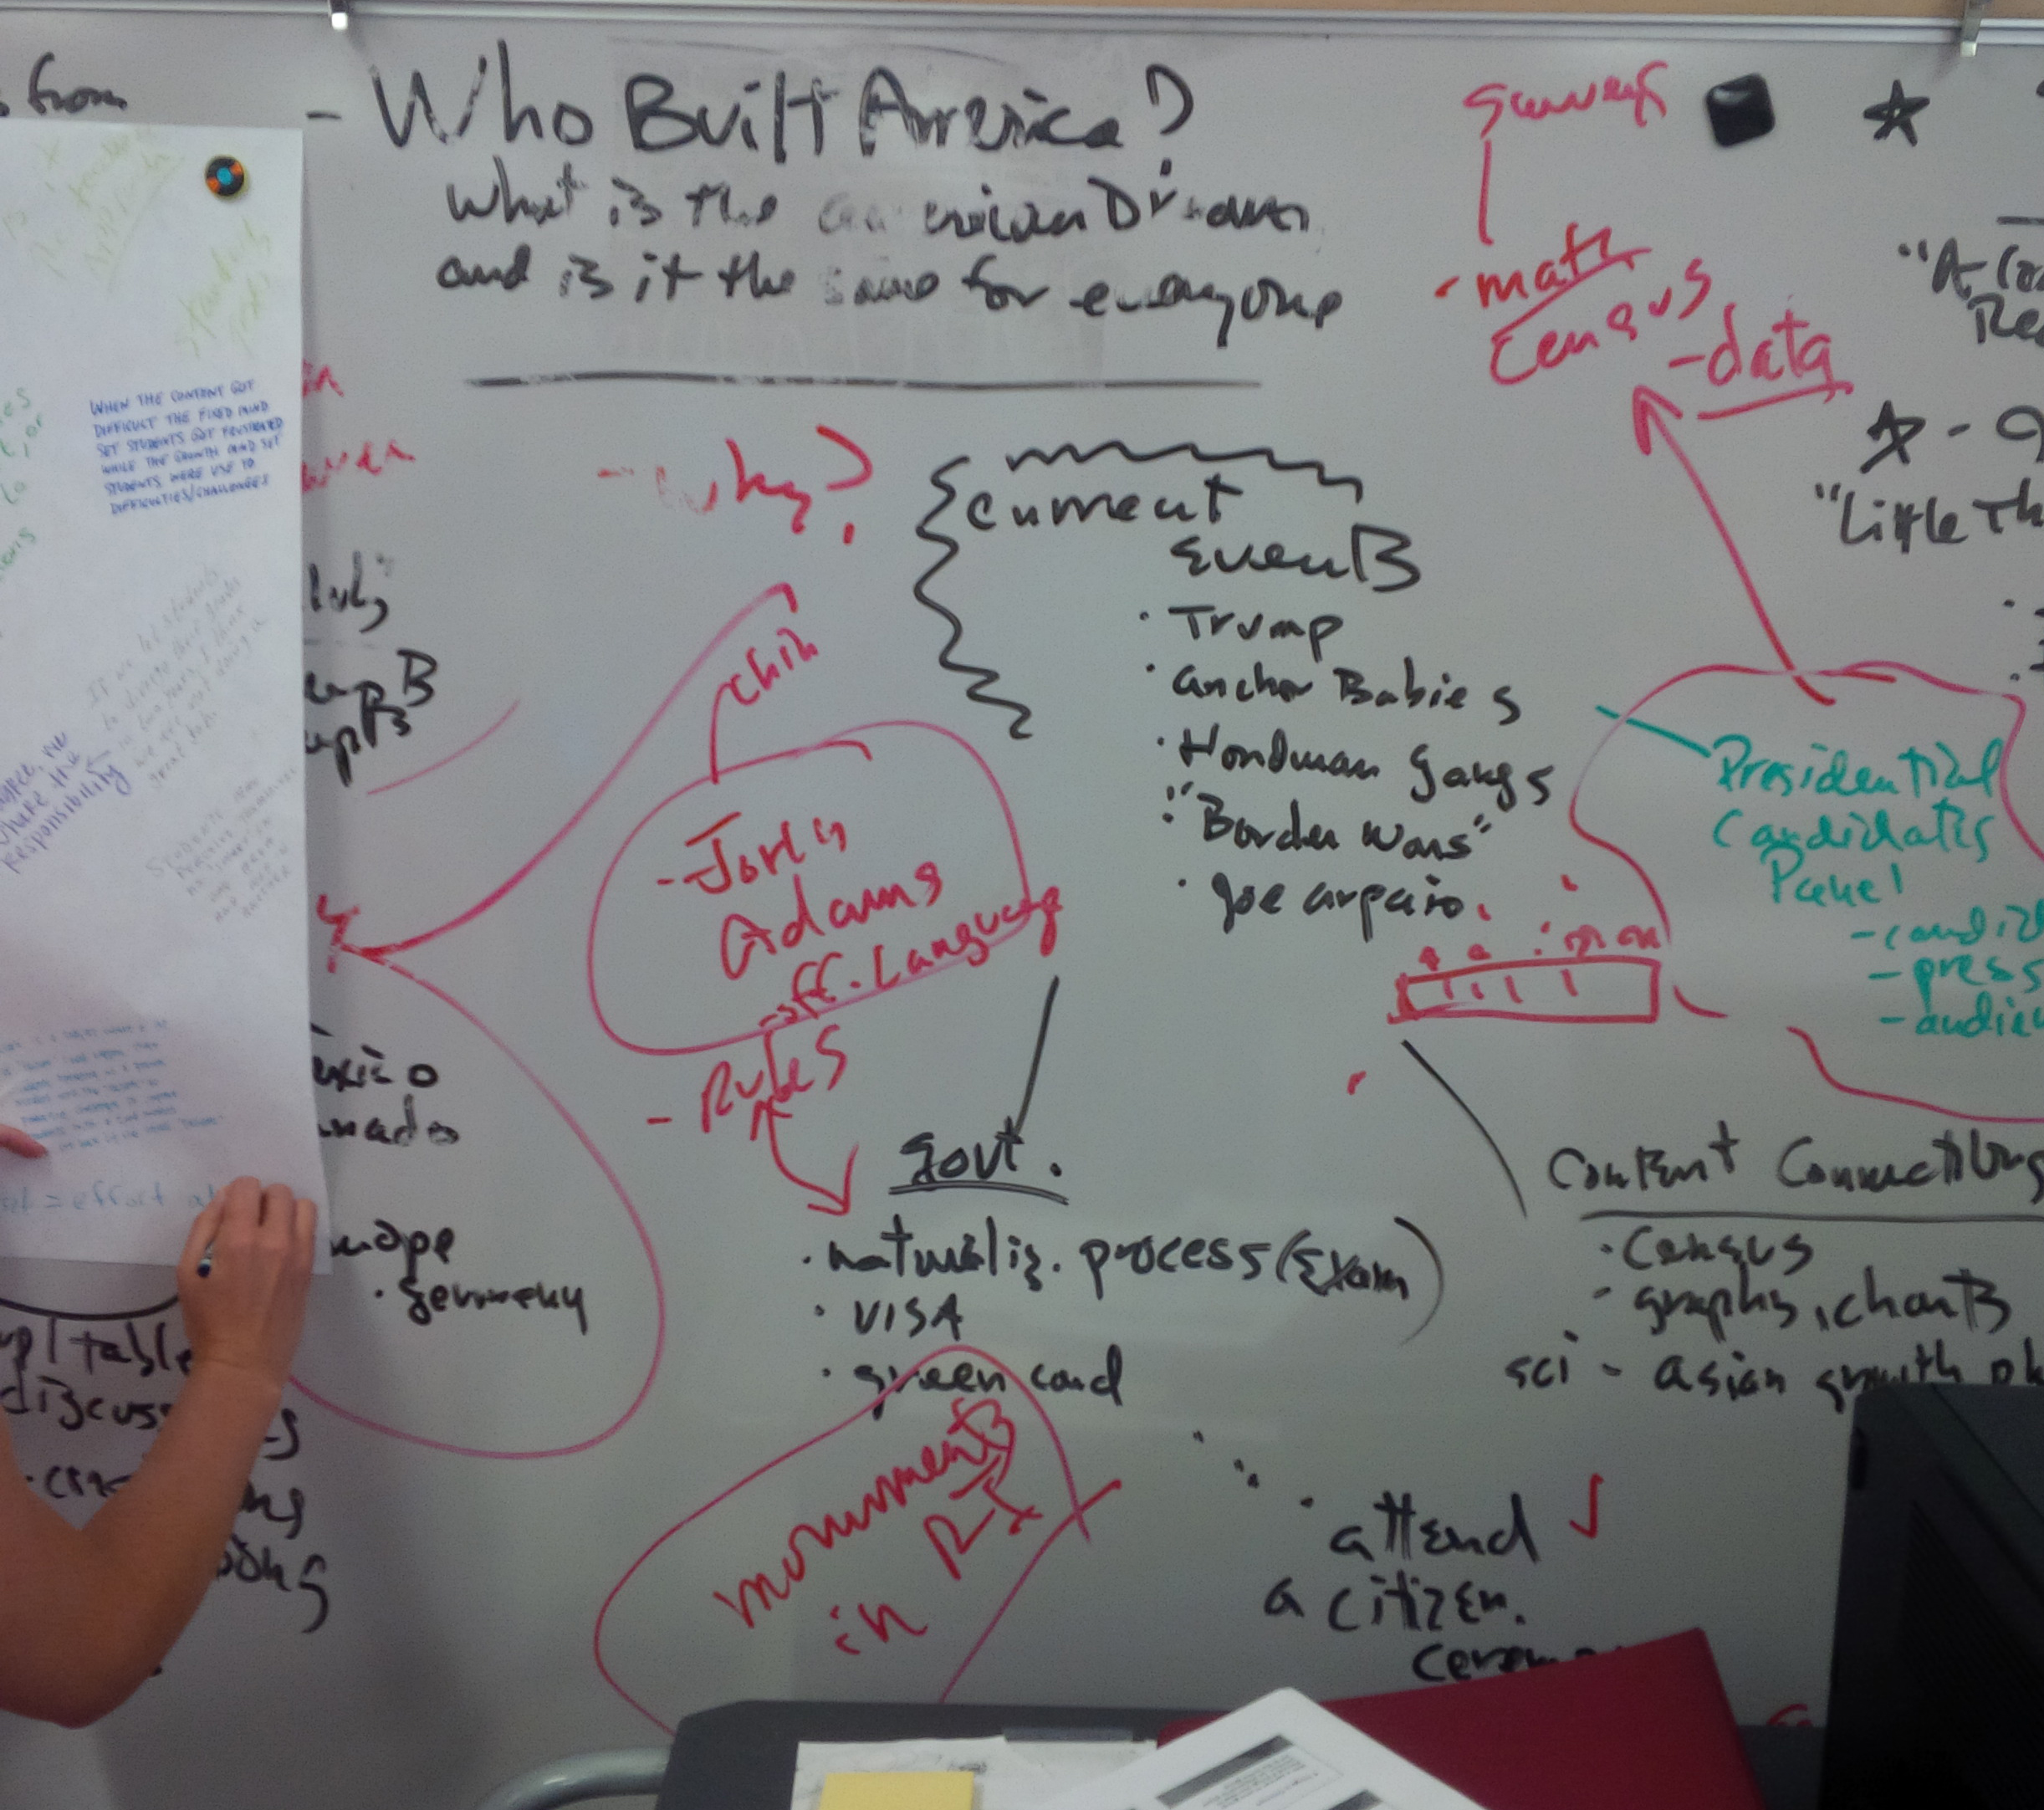 A Civics/Social Studies Learning Mural at Alvarez HS